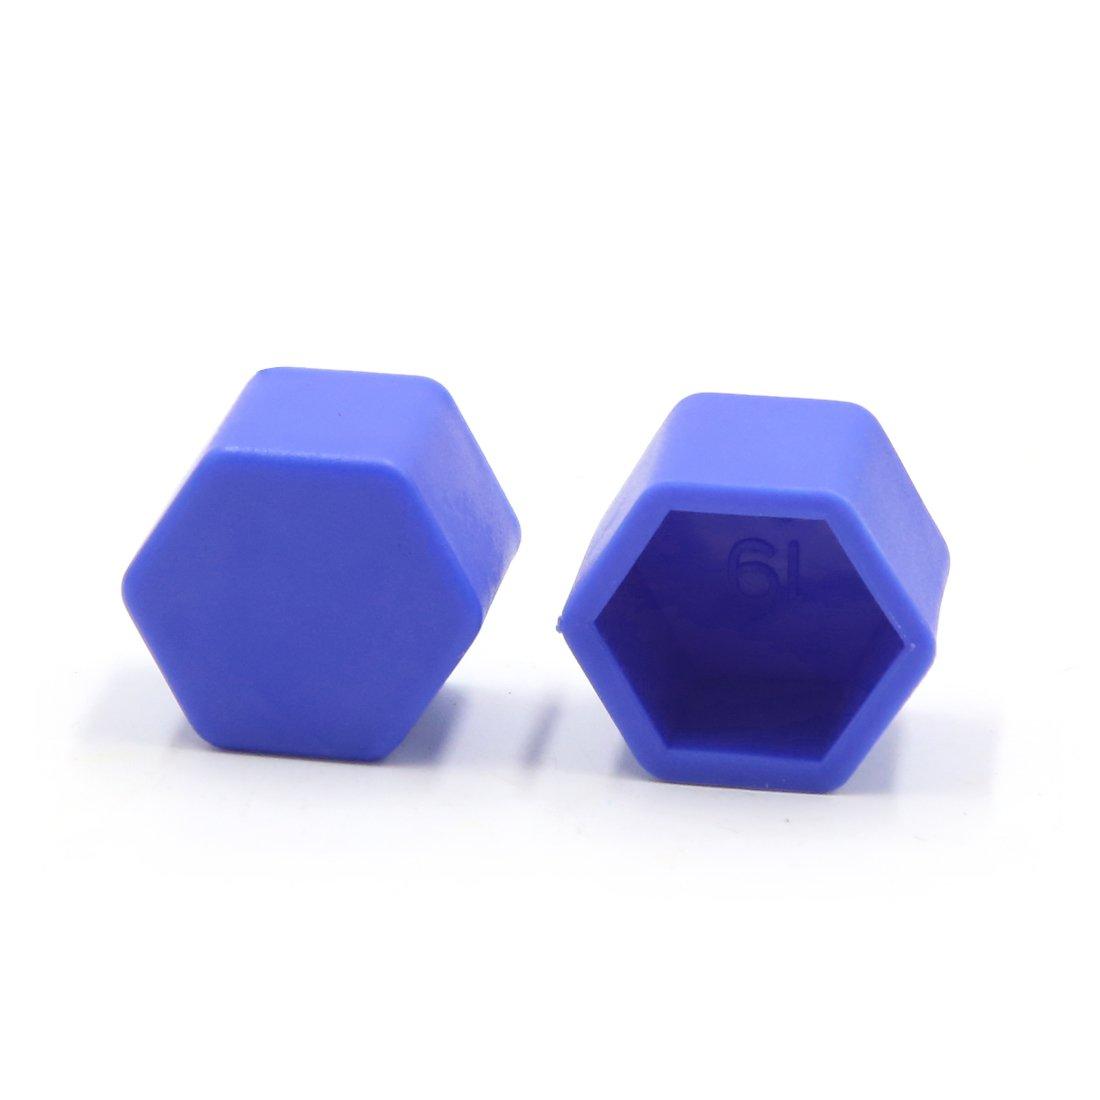 uxcell 20Pcs 17mm Blue Silicone Car Wheel Lug Nut Bolt Hub Covers Screw Dust Caps a17051100ux0625